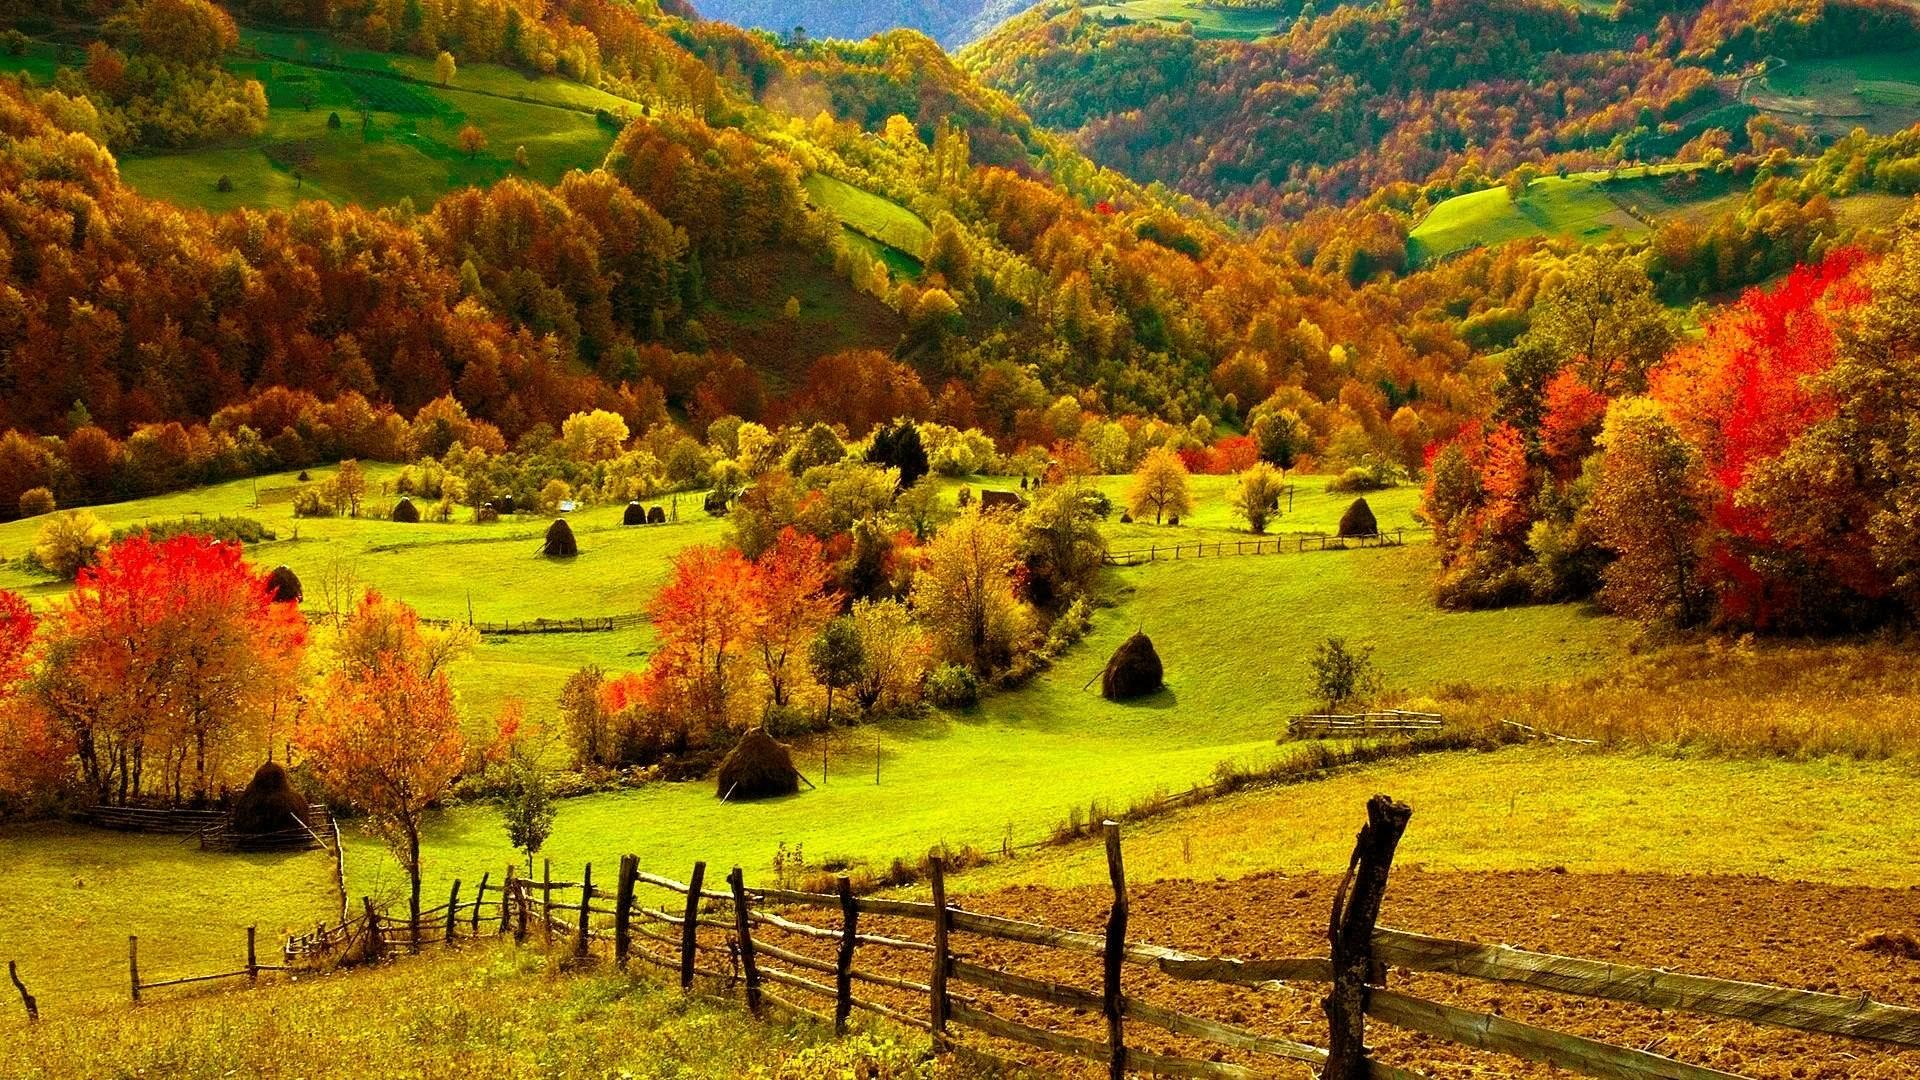 Fall Farm Desktop Wallpaper